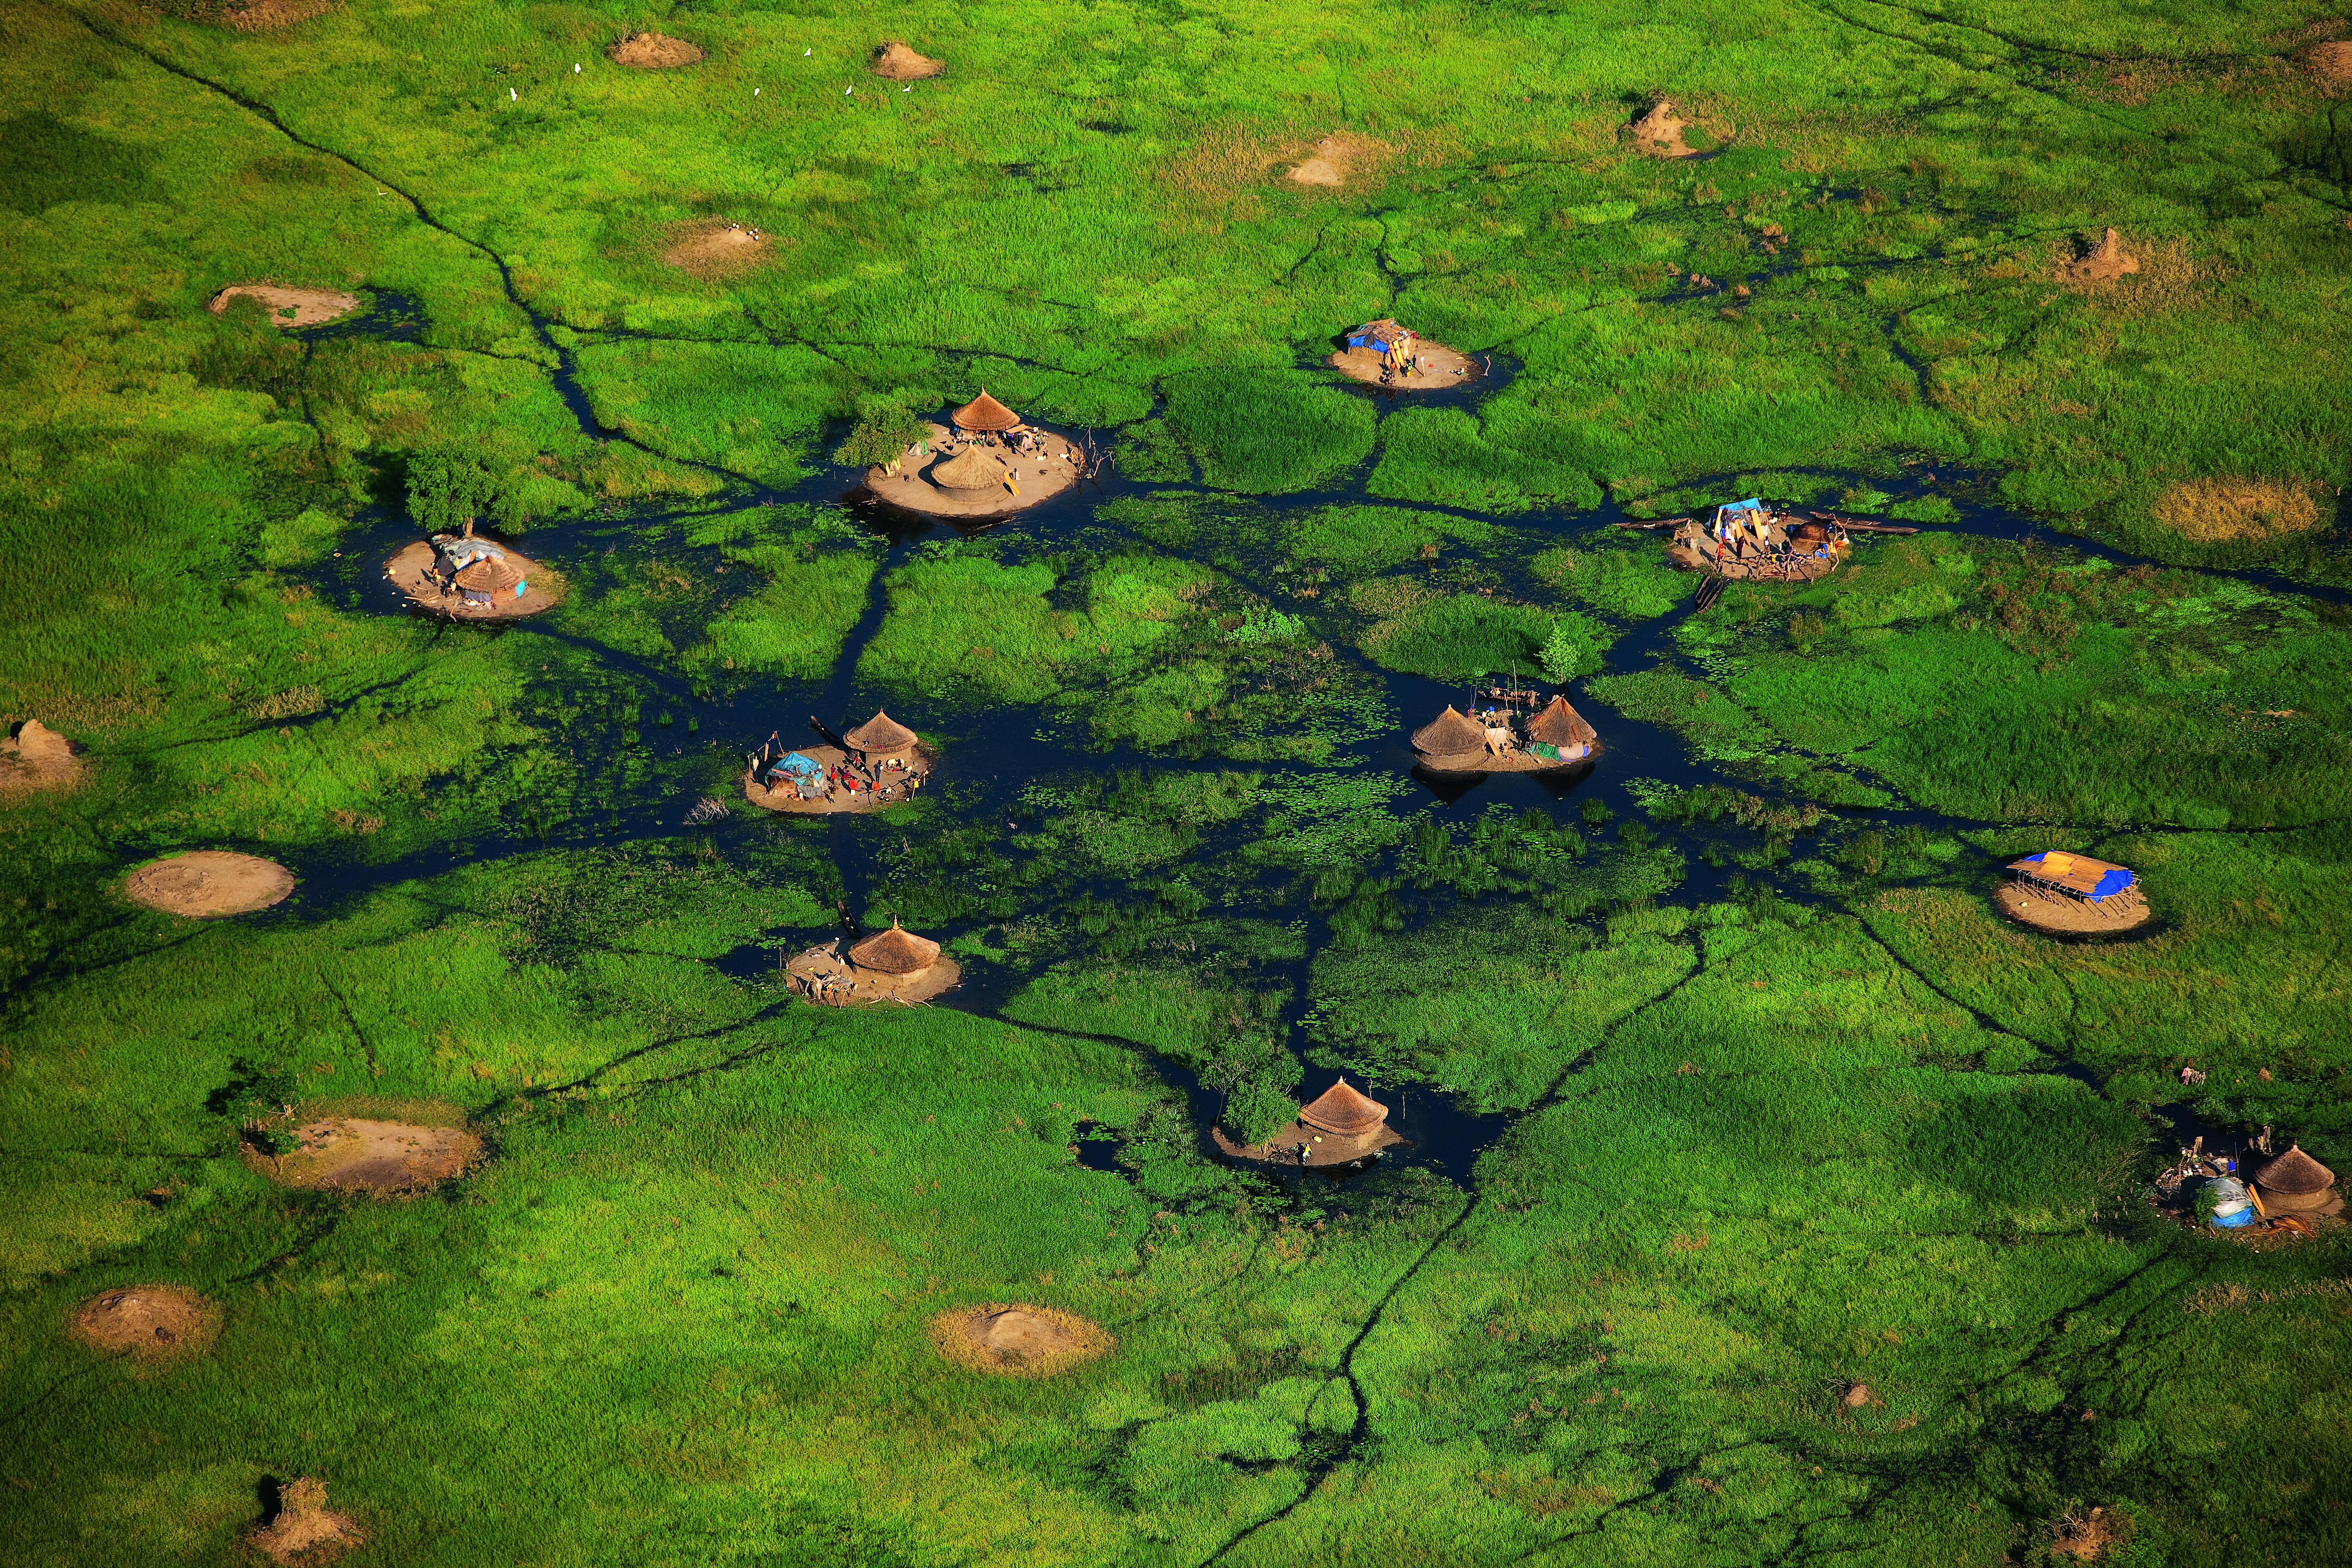 YANN ARTHUS-BERTRAND Village in the White Nile swamps near Bor, Jonglei, South Sudan (6°22' N – 31°32' E).